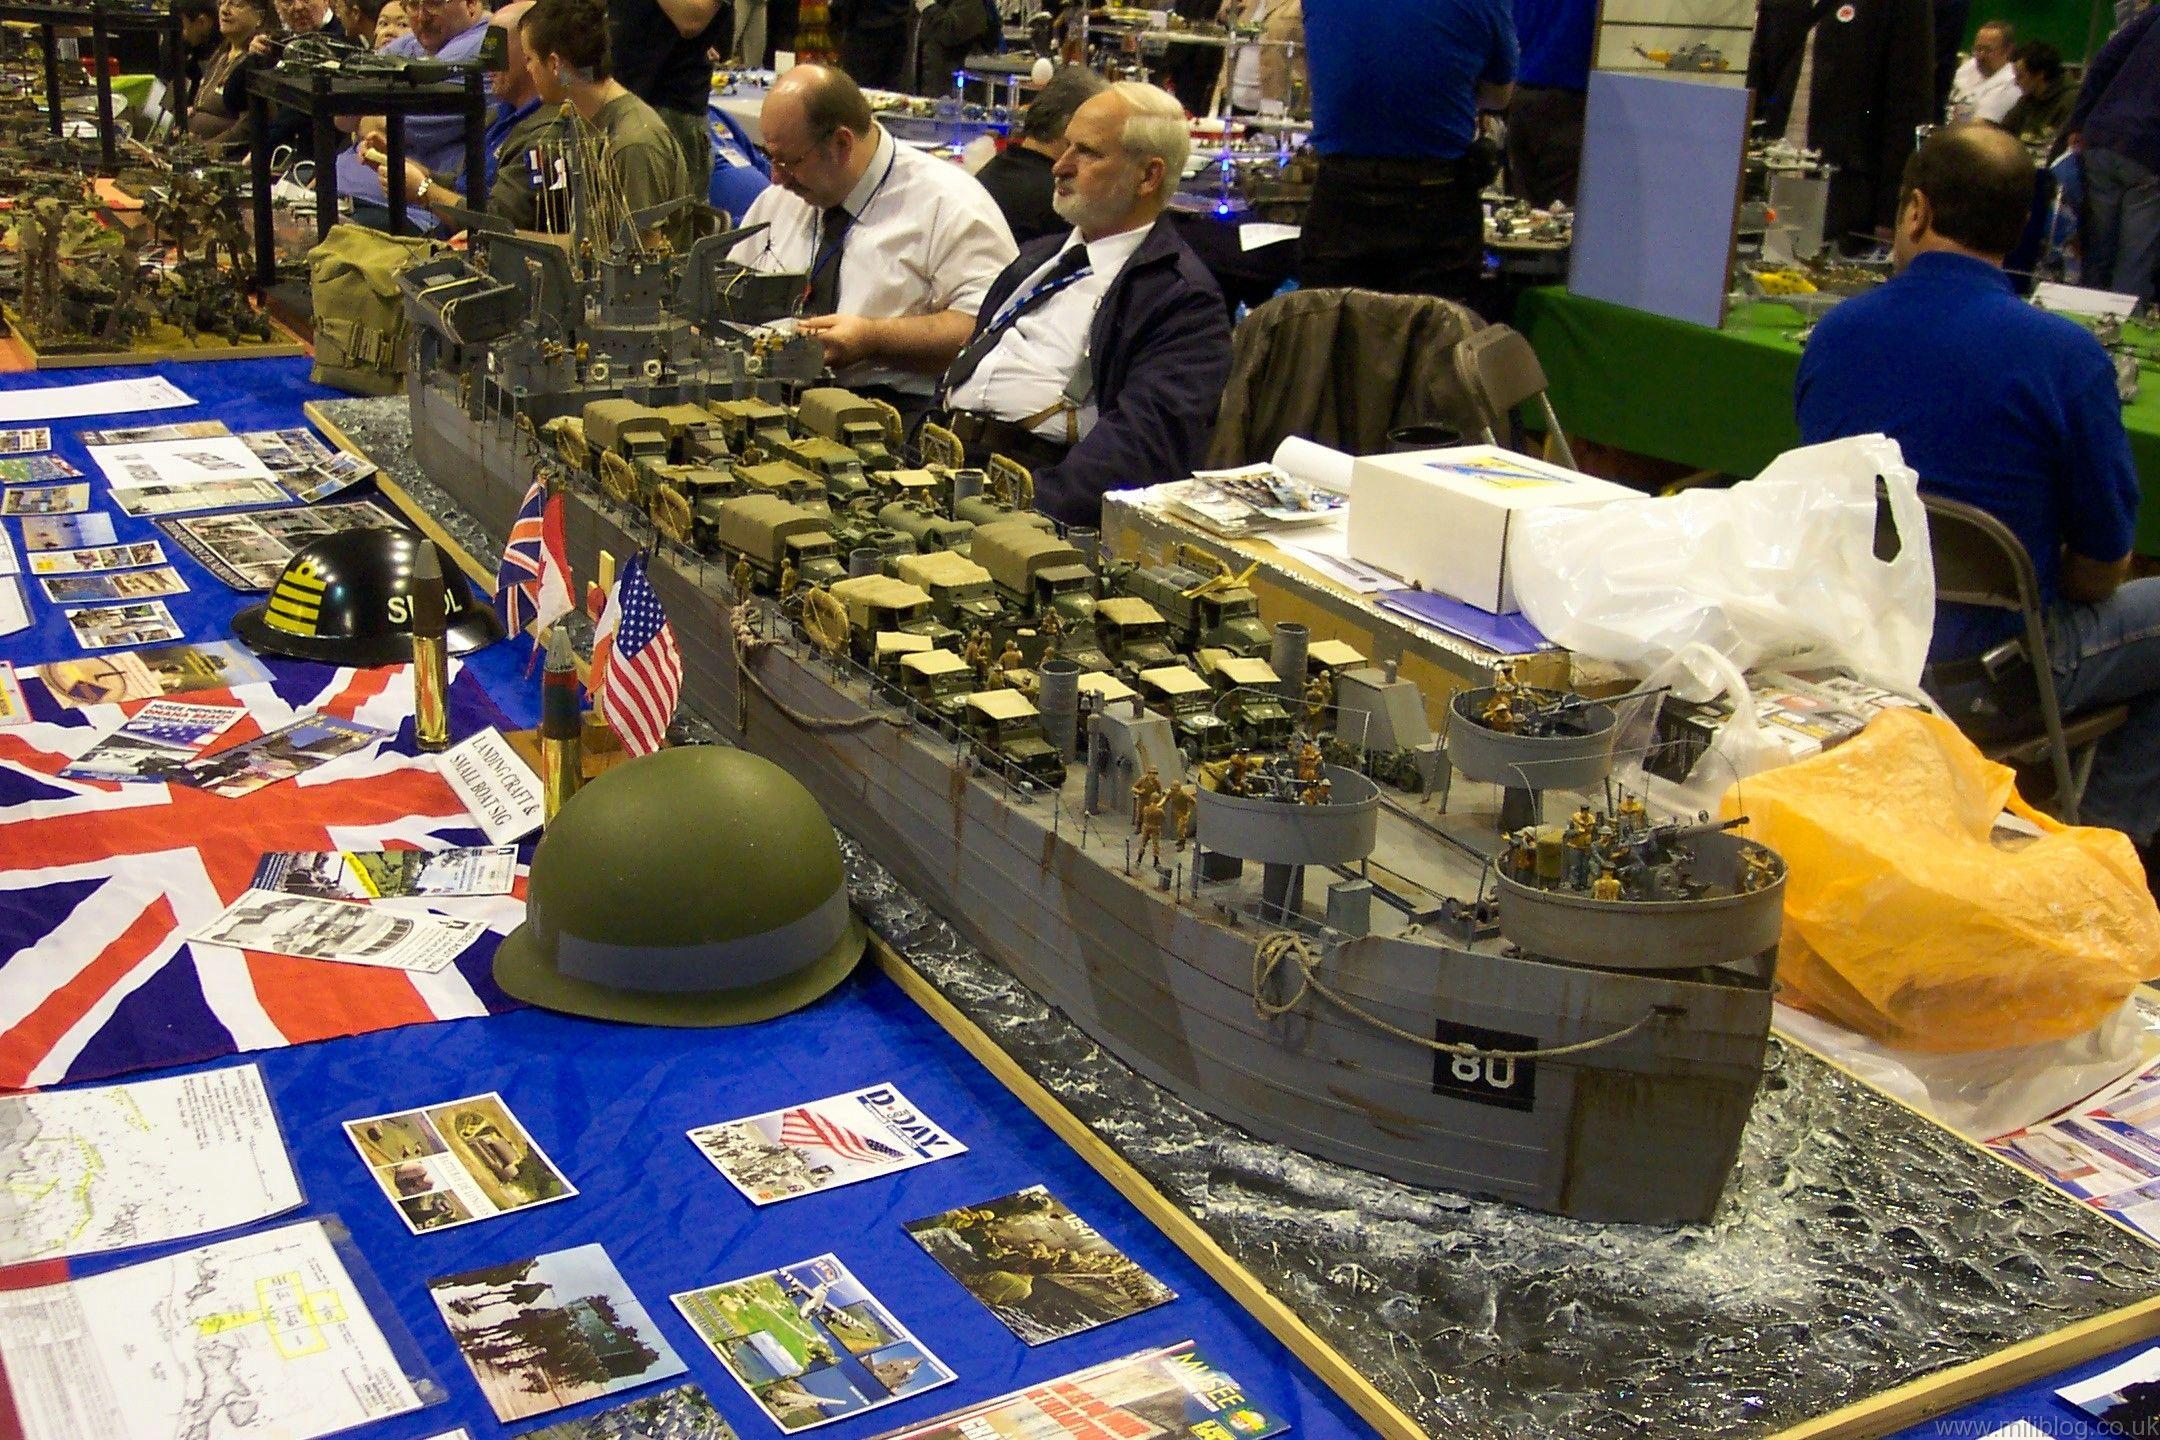 d day landing craft design